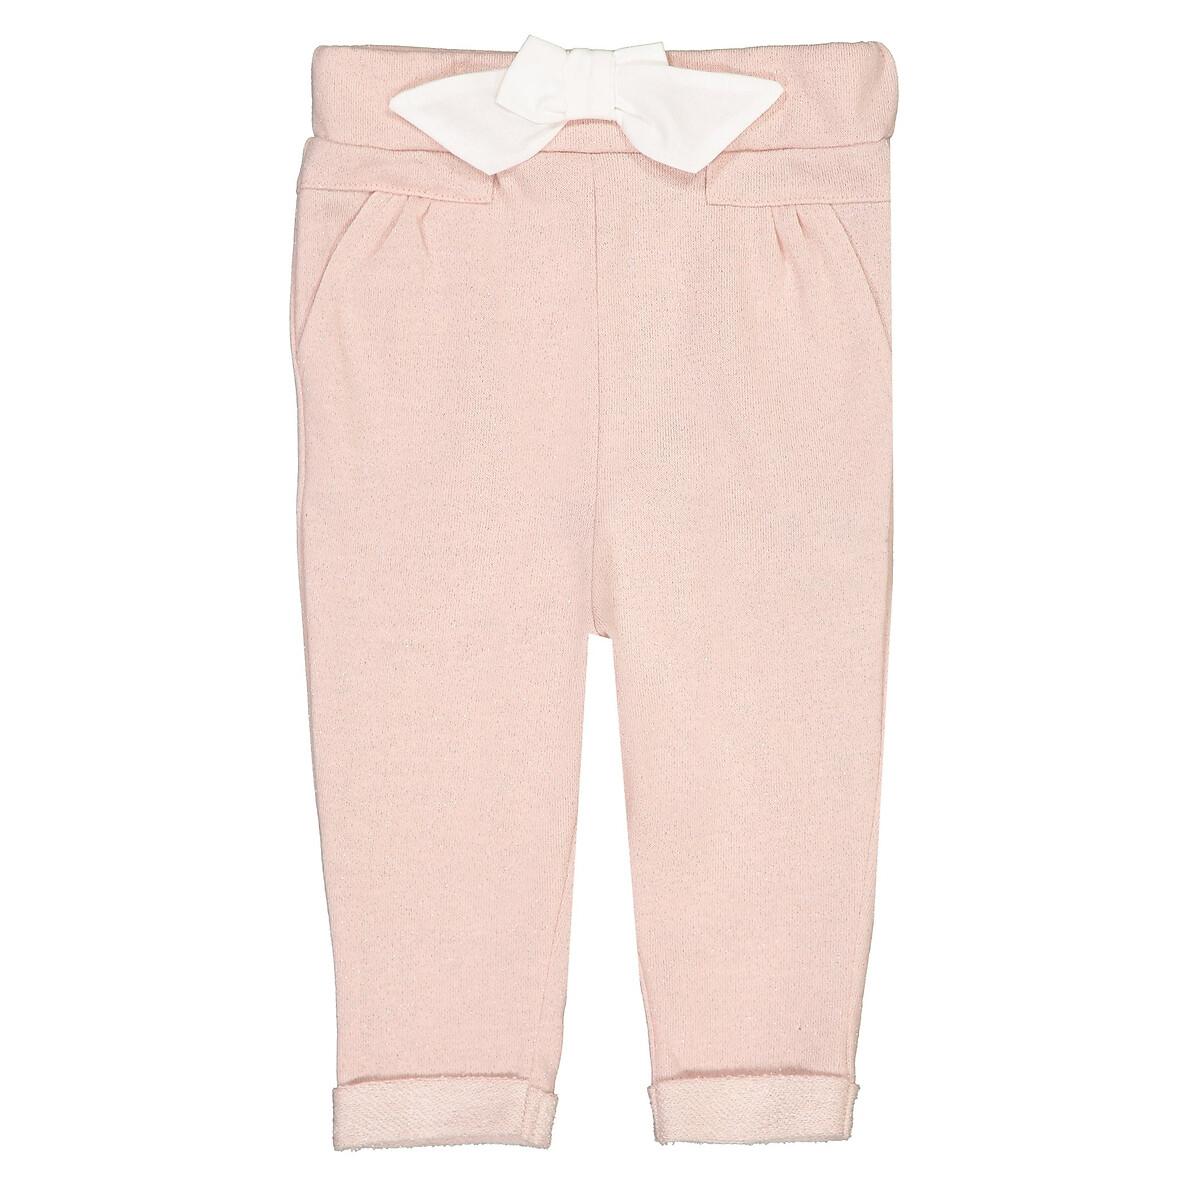 Фото - Брюки LaRedoute Из мольтона с бантом 1 мес - 3 года 6 мес. - 67 см розовый брюки laredoute из мольтона с бантом 1 мес 3 года 9 мес 71 см розовый